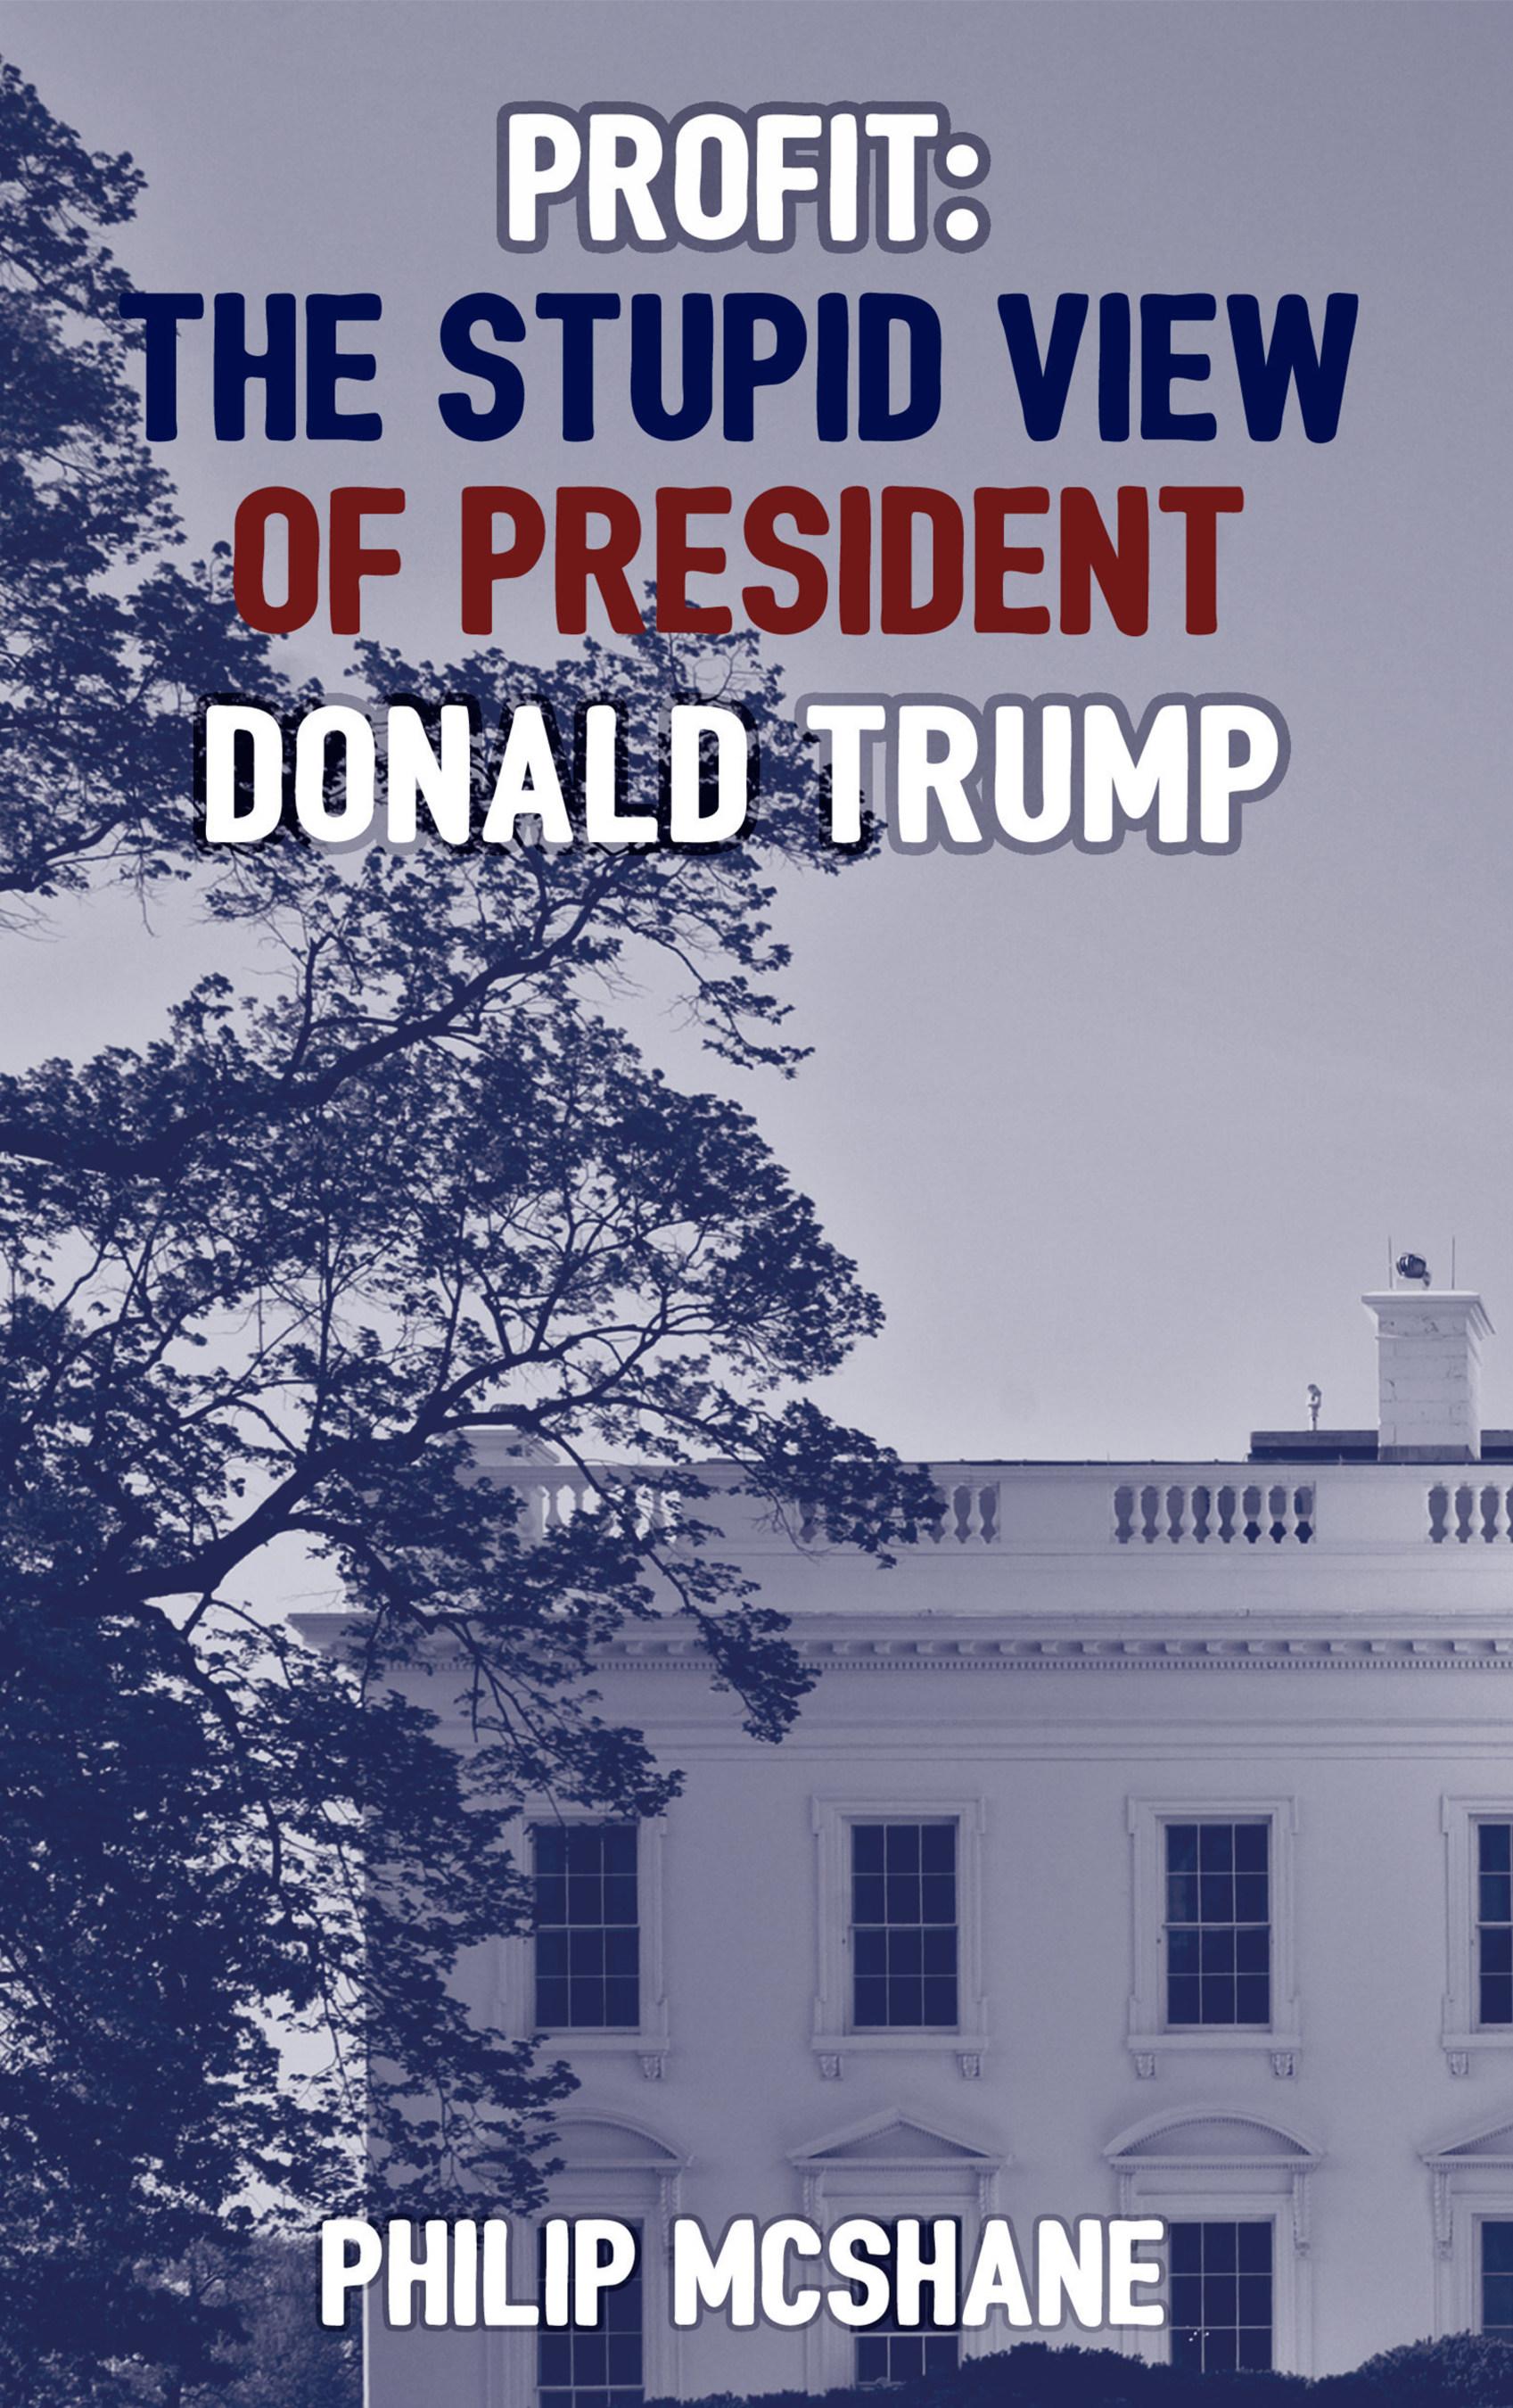 Profit: The Stupid View of President Donald Trump